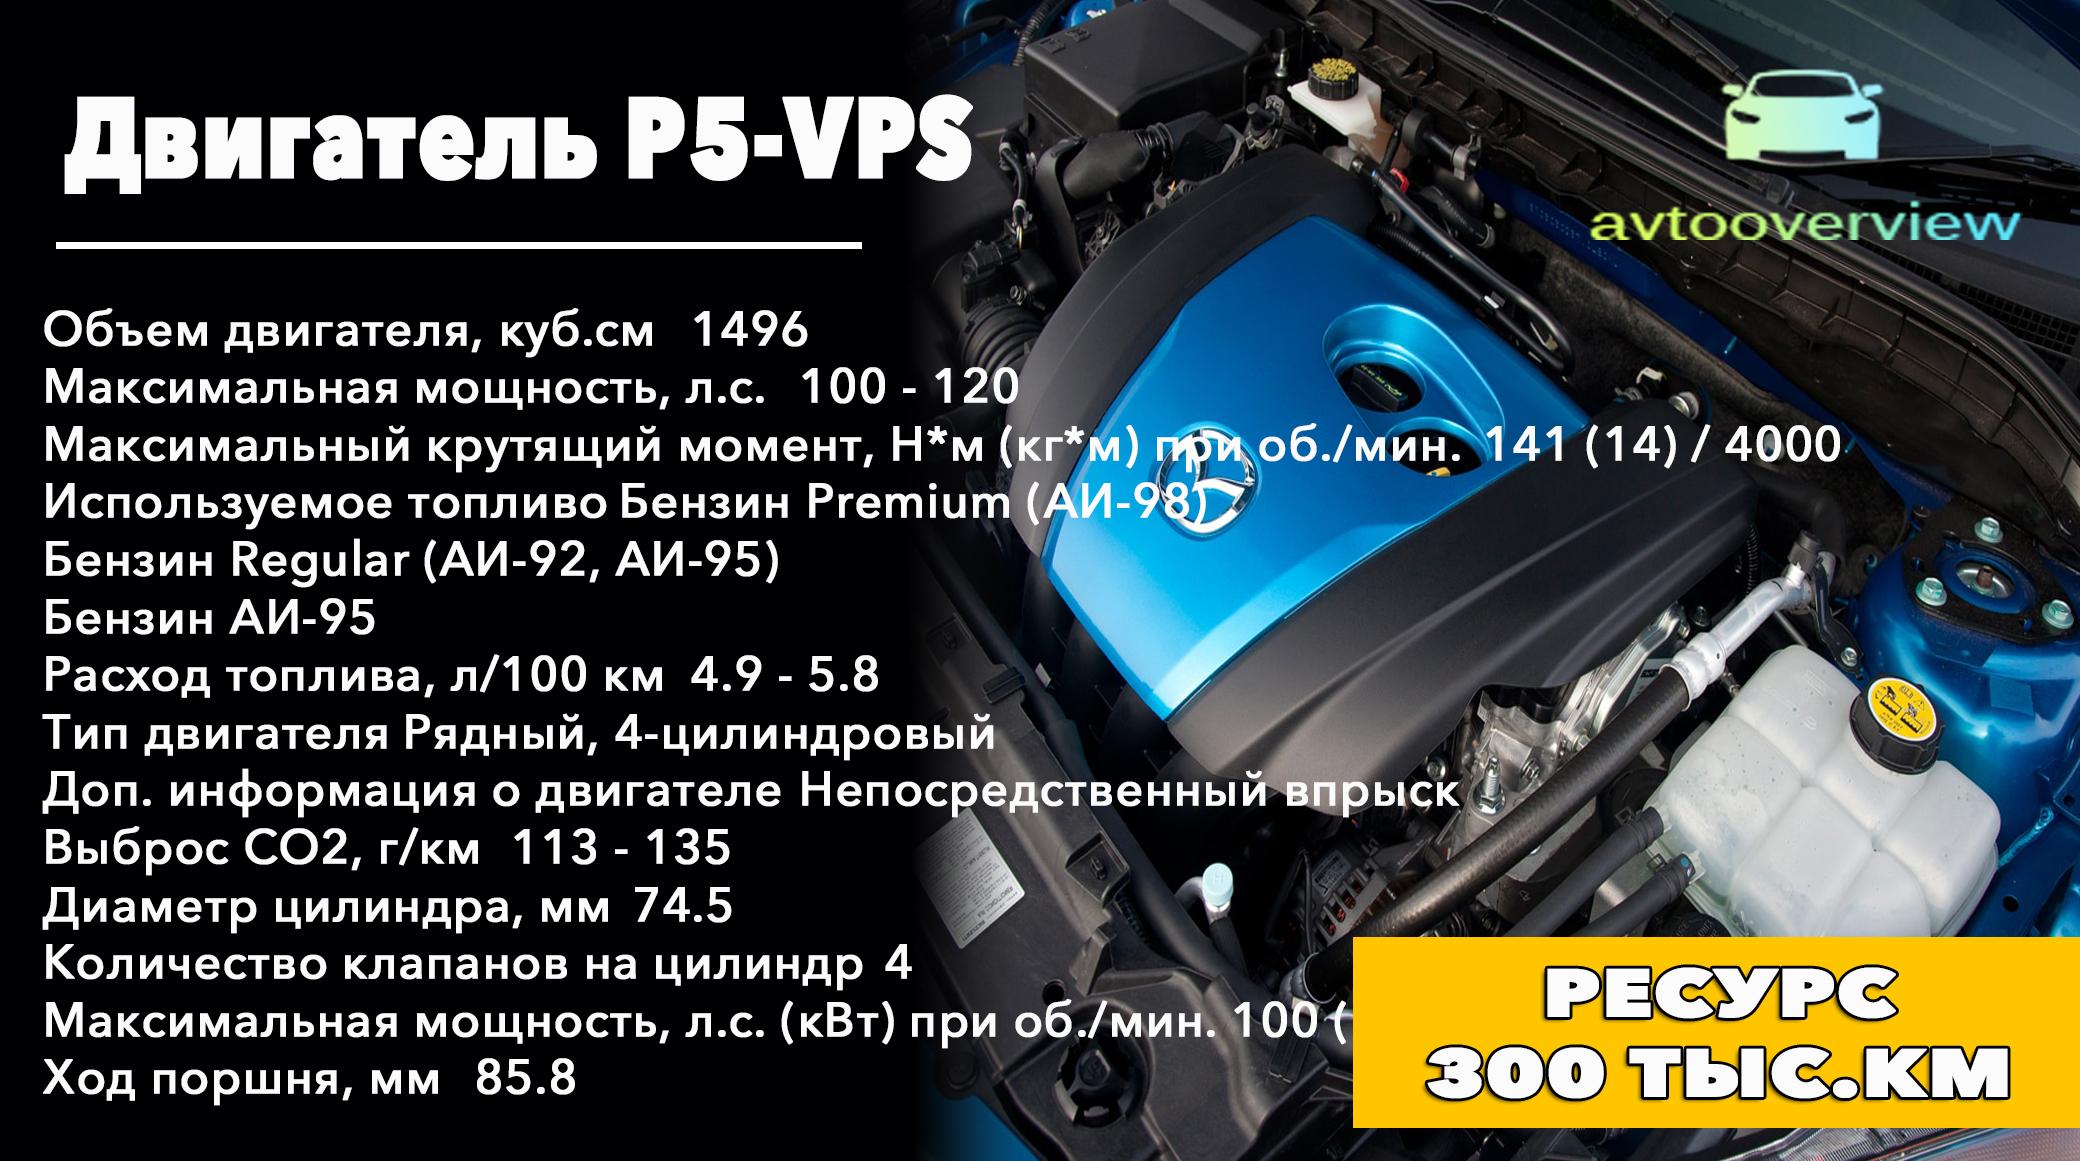 Обзор P5-VPS